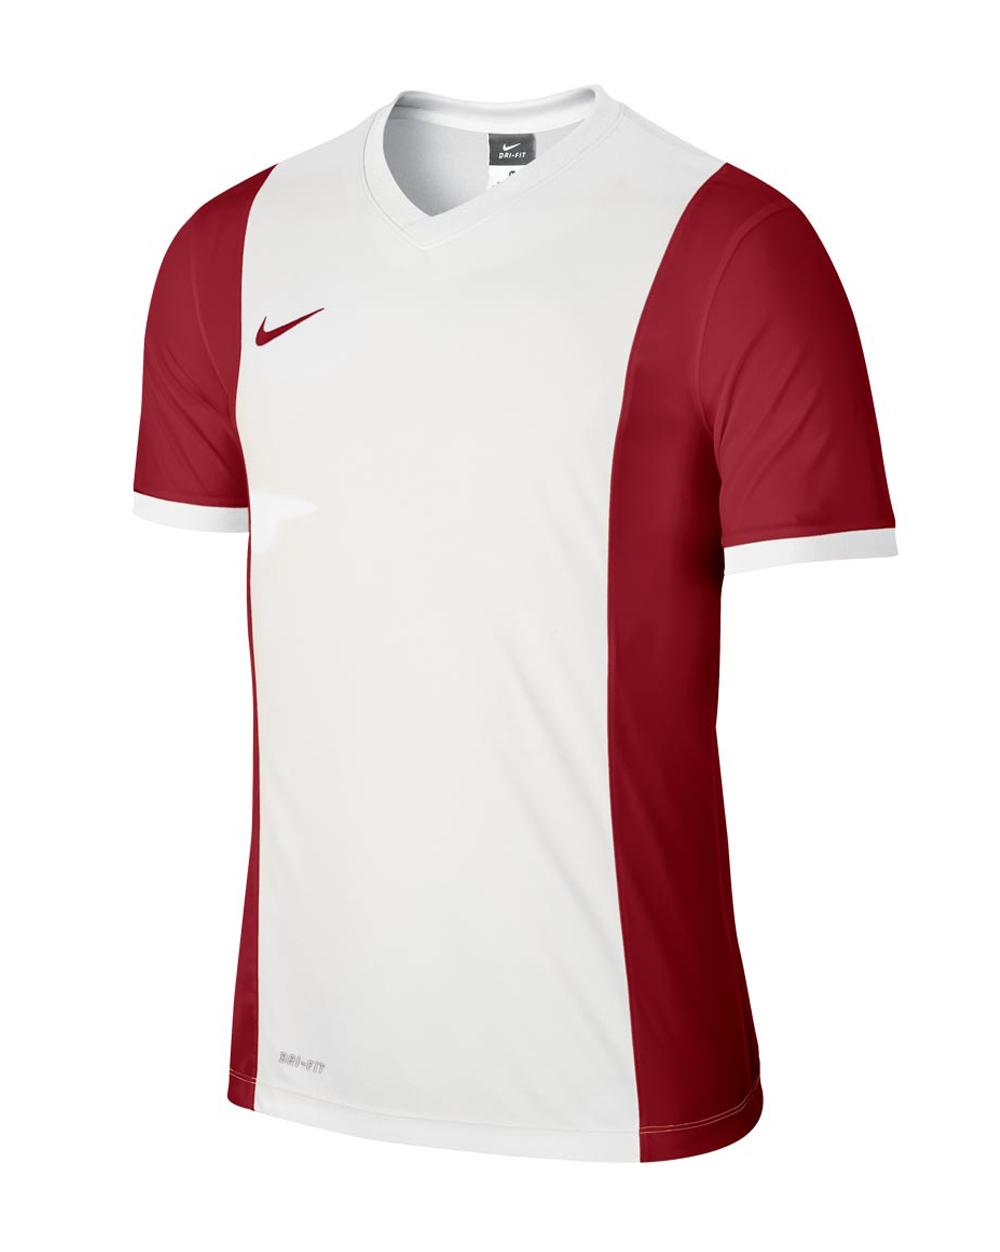 camisetas nike personalizadas